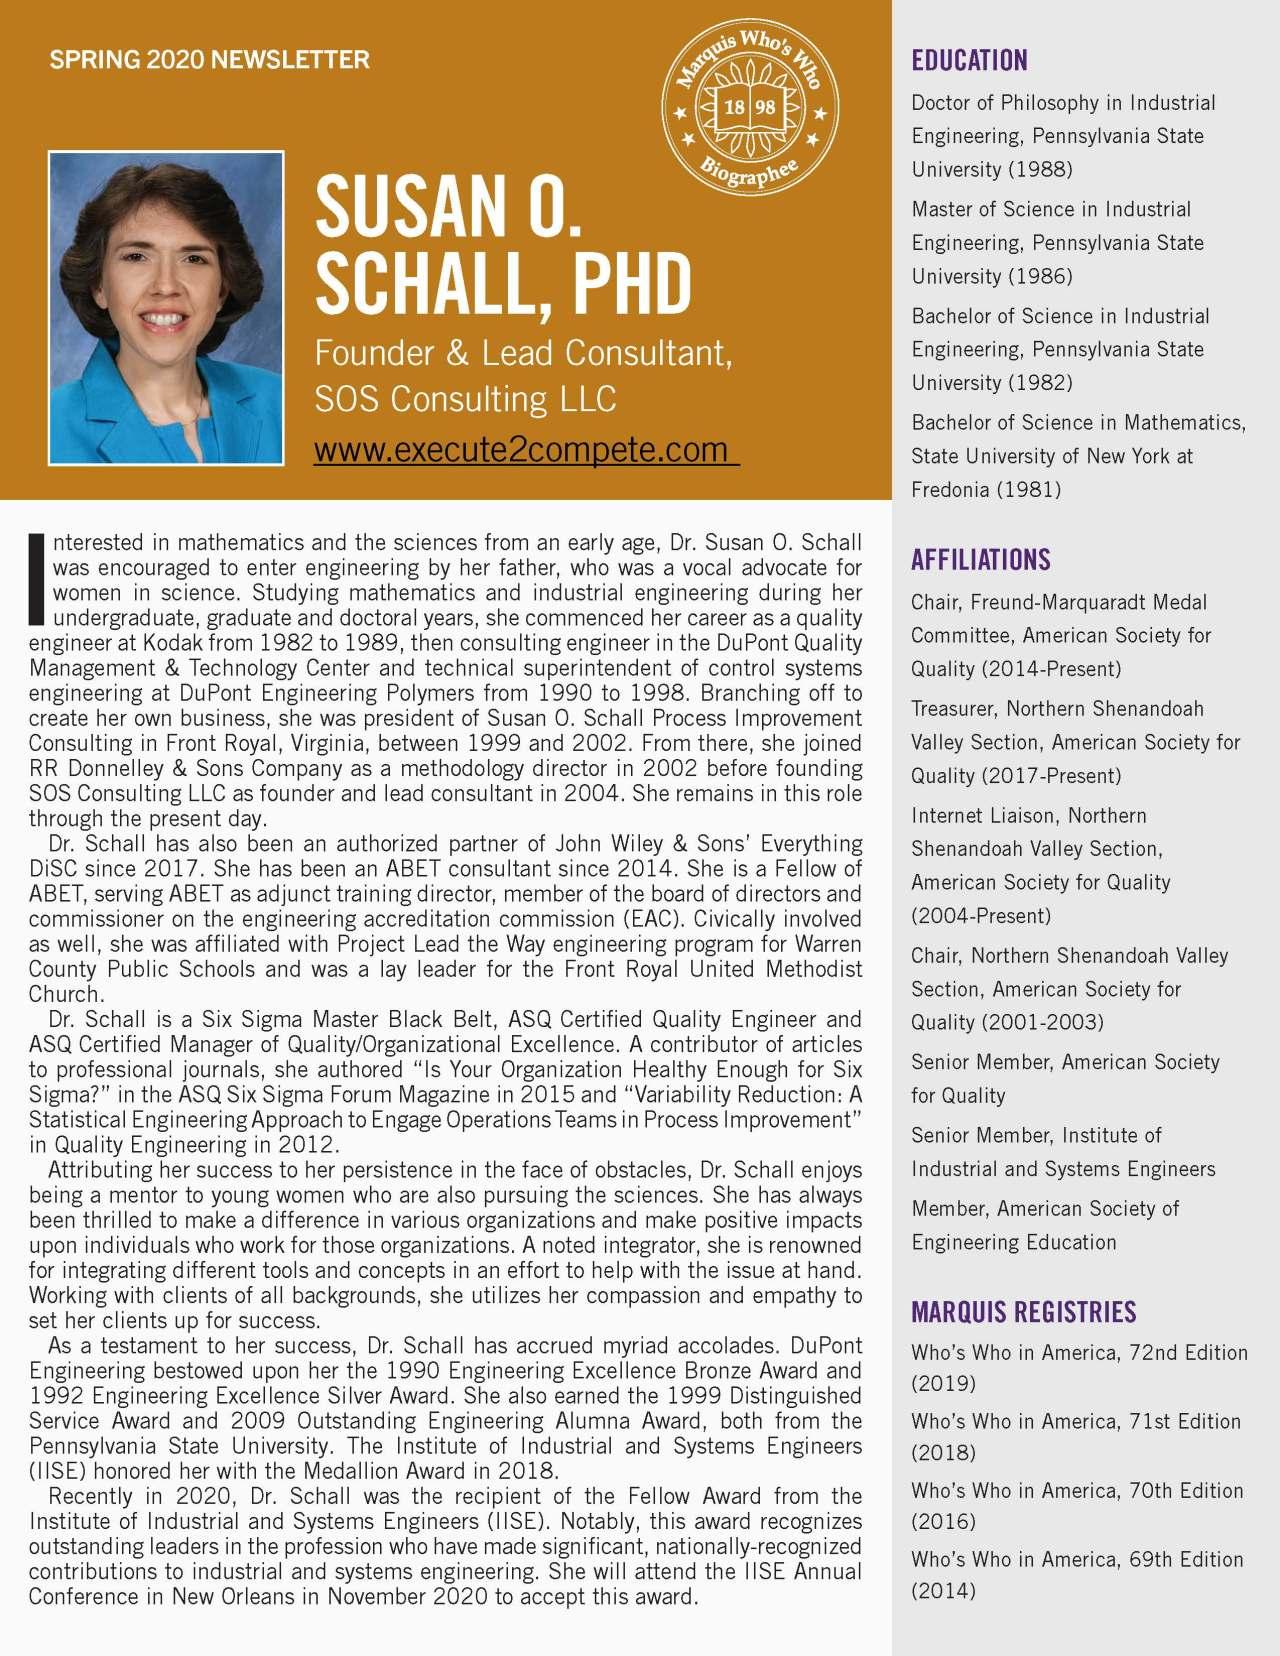 Schall, Susan 2126573_36857181 Newsletter